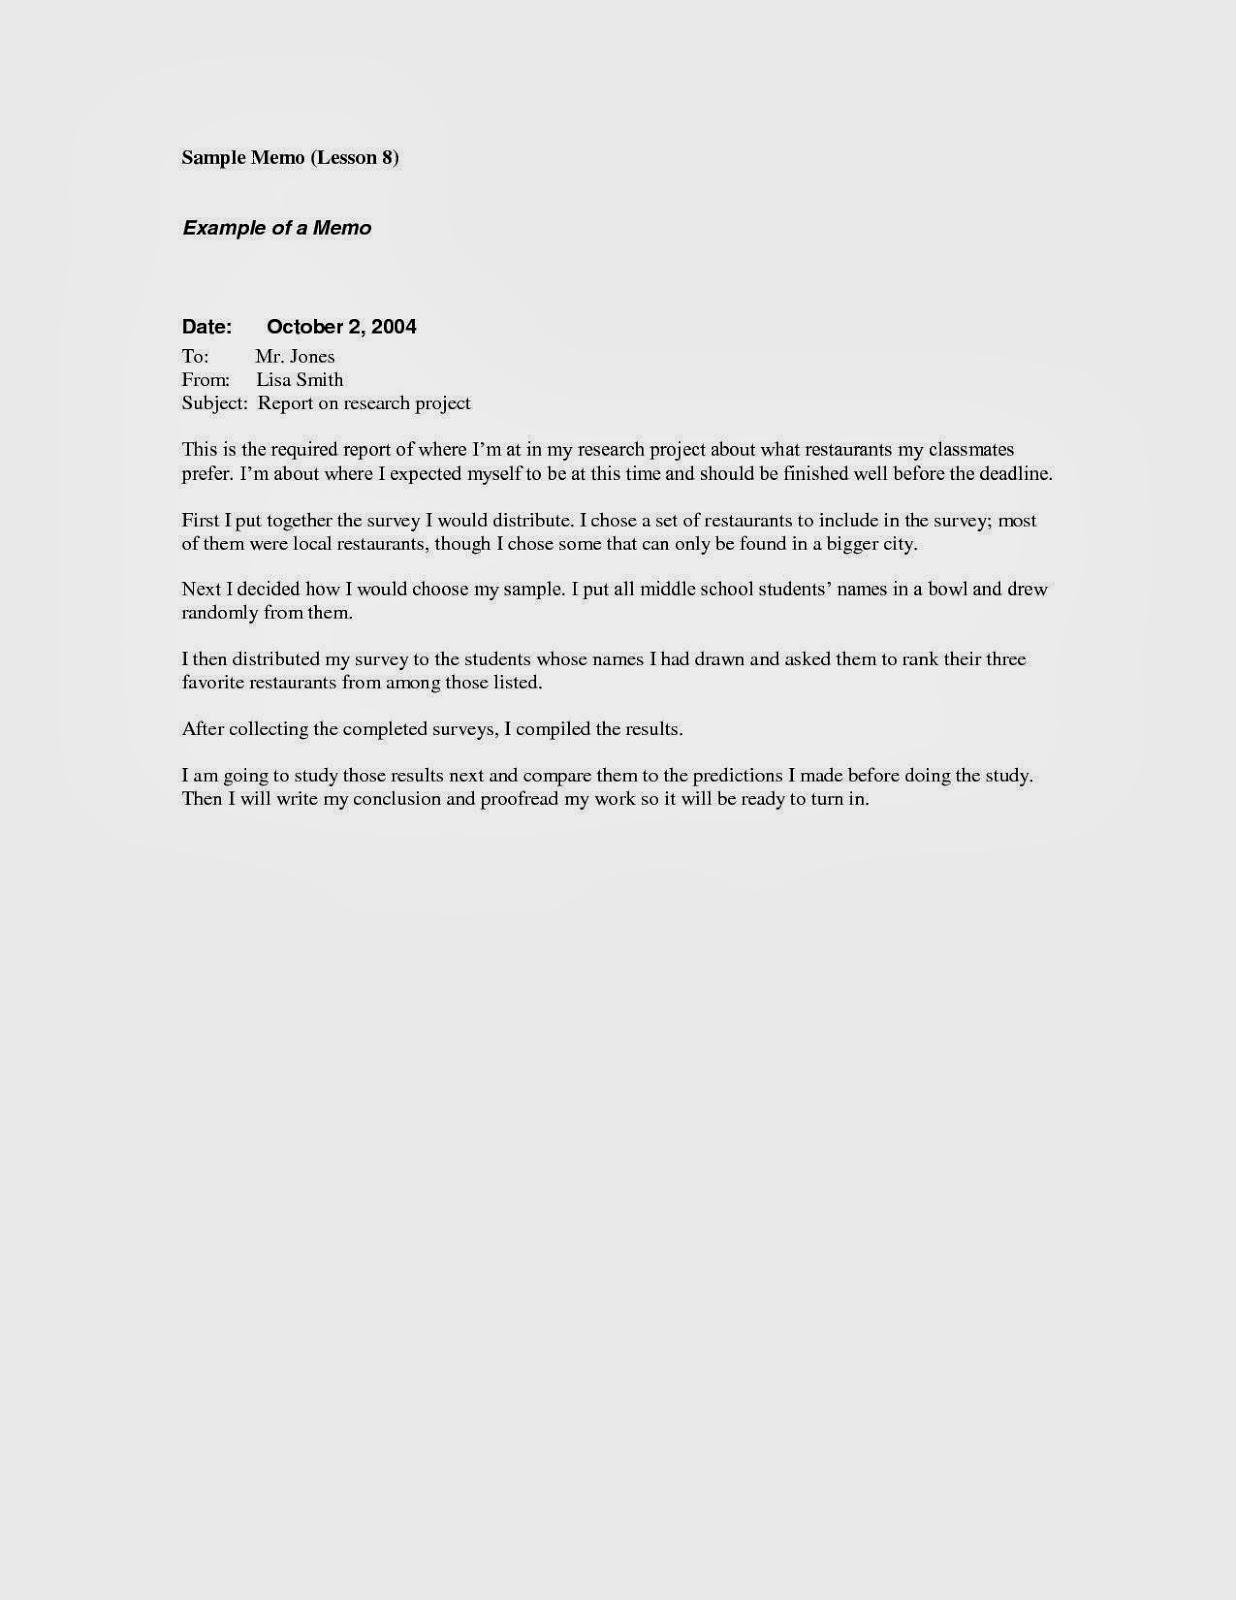 Write Memo Template appeal incident report 10 internal memo – Internal Memo Template